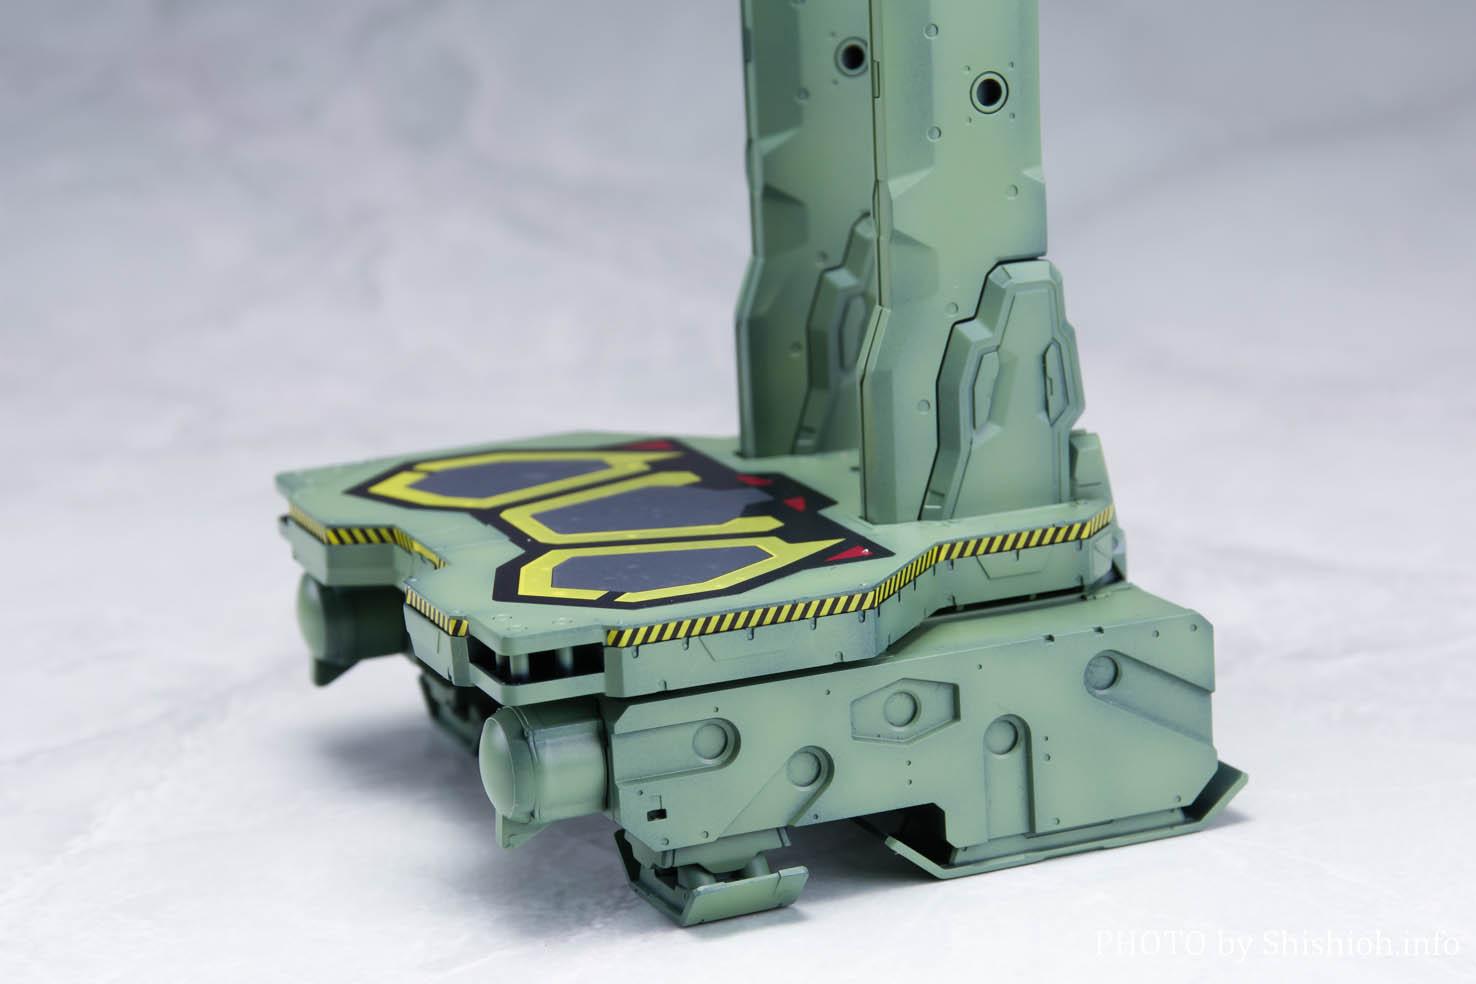 RG 汎用ヒト型決戦兵器 人造人間エヴァンゲリオン初号機DX 輸送台セット